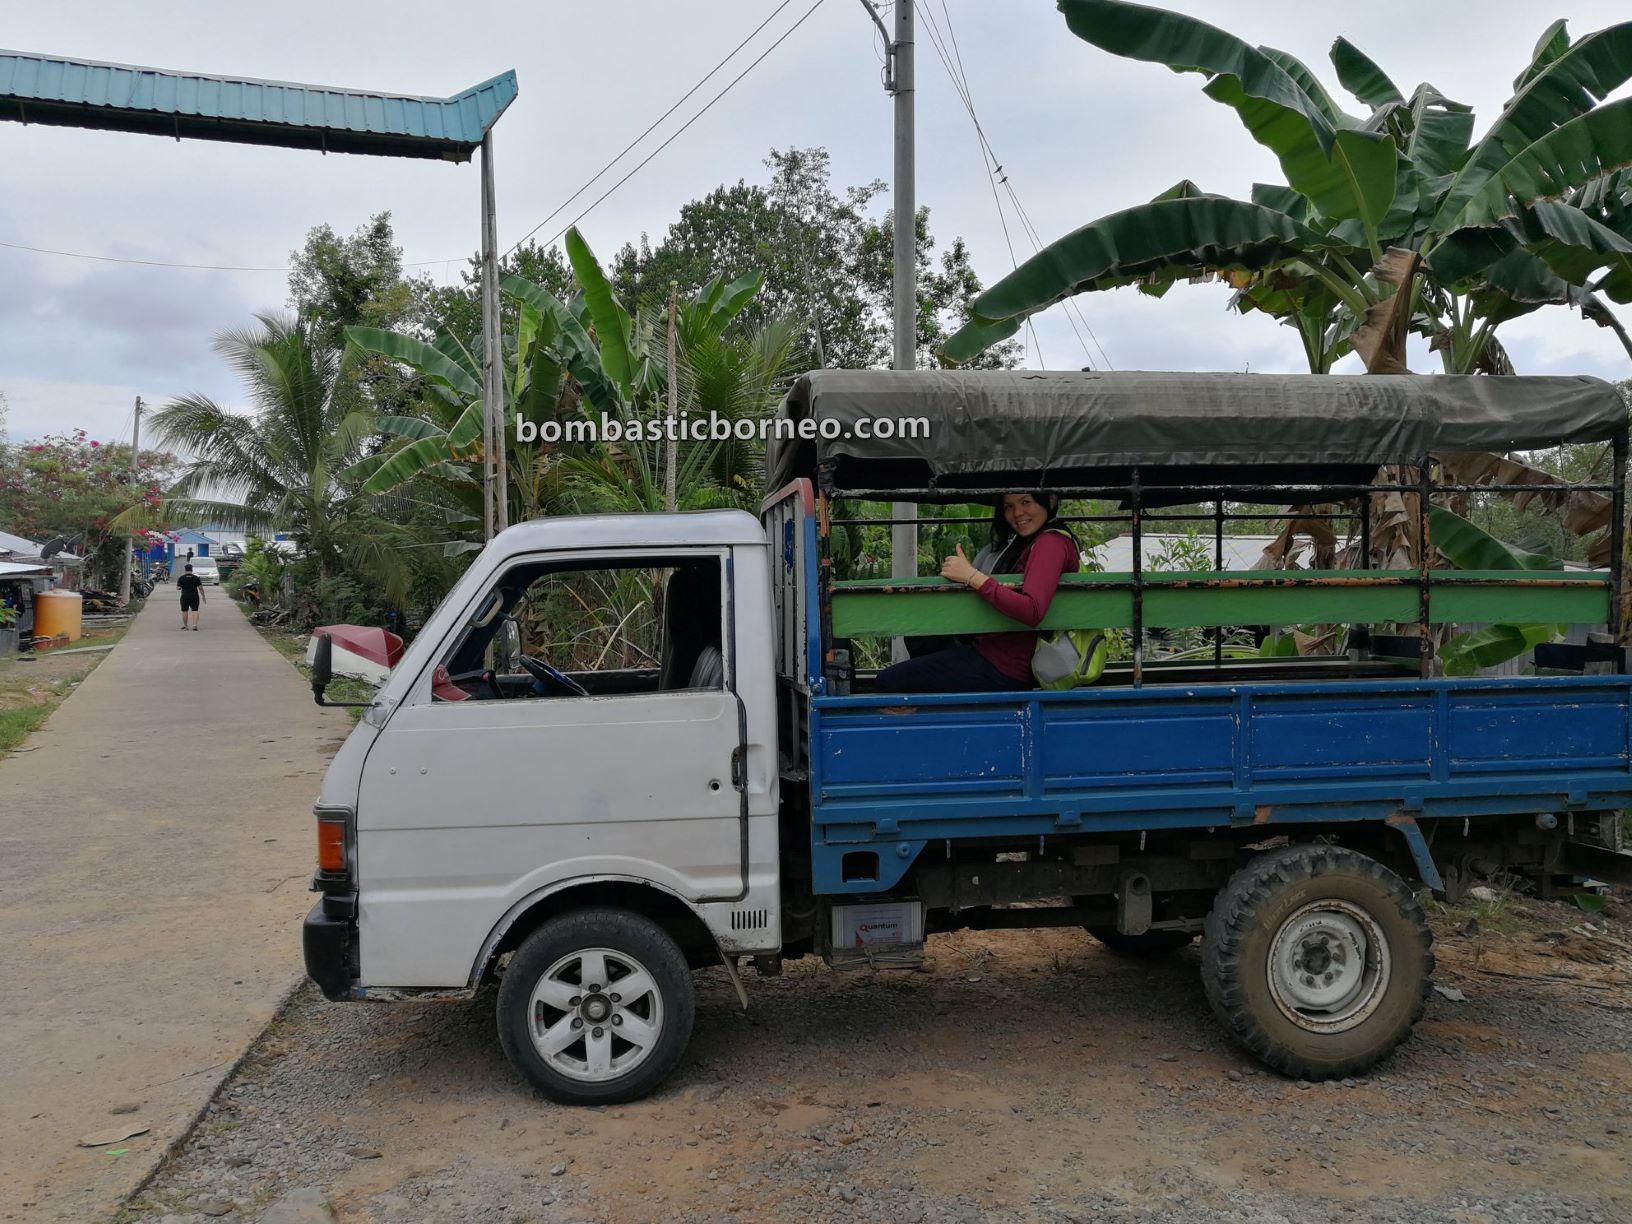 adventure, backpackers, exploration, jelajah, Kampung Melayu, malay village, Tawau, Malaysia, Bergosong, Mentadak Baru, Tongkang, Wallace Bay, Tourism, Borneo